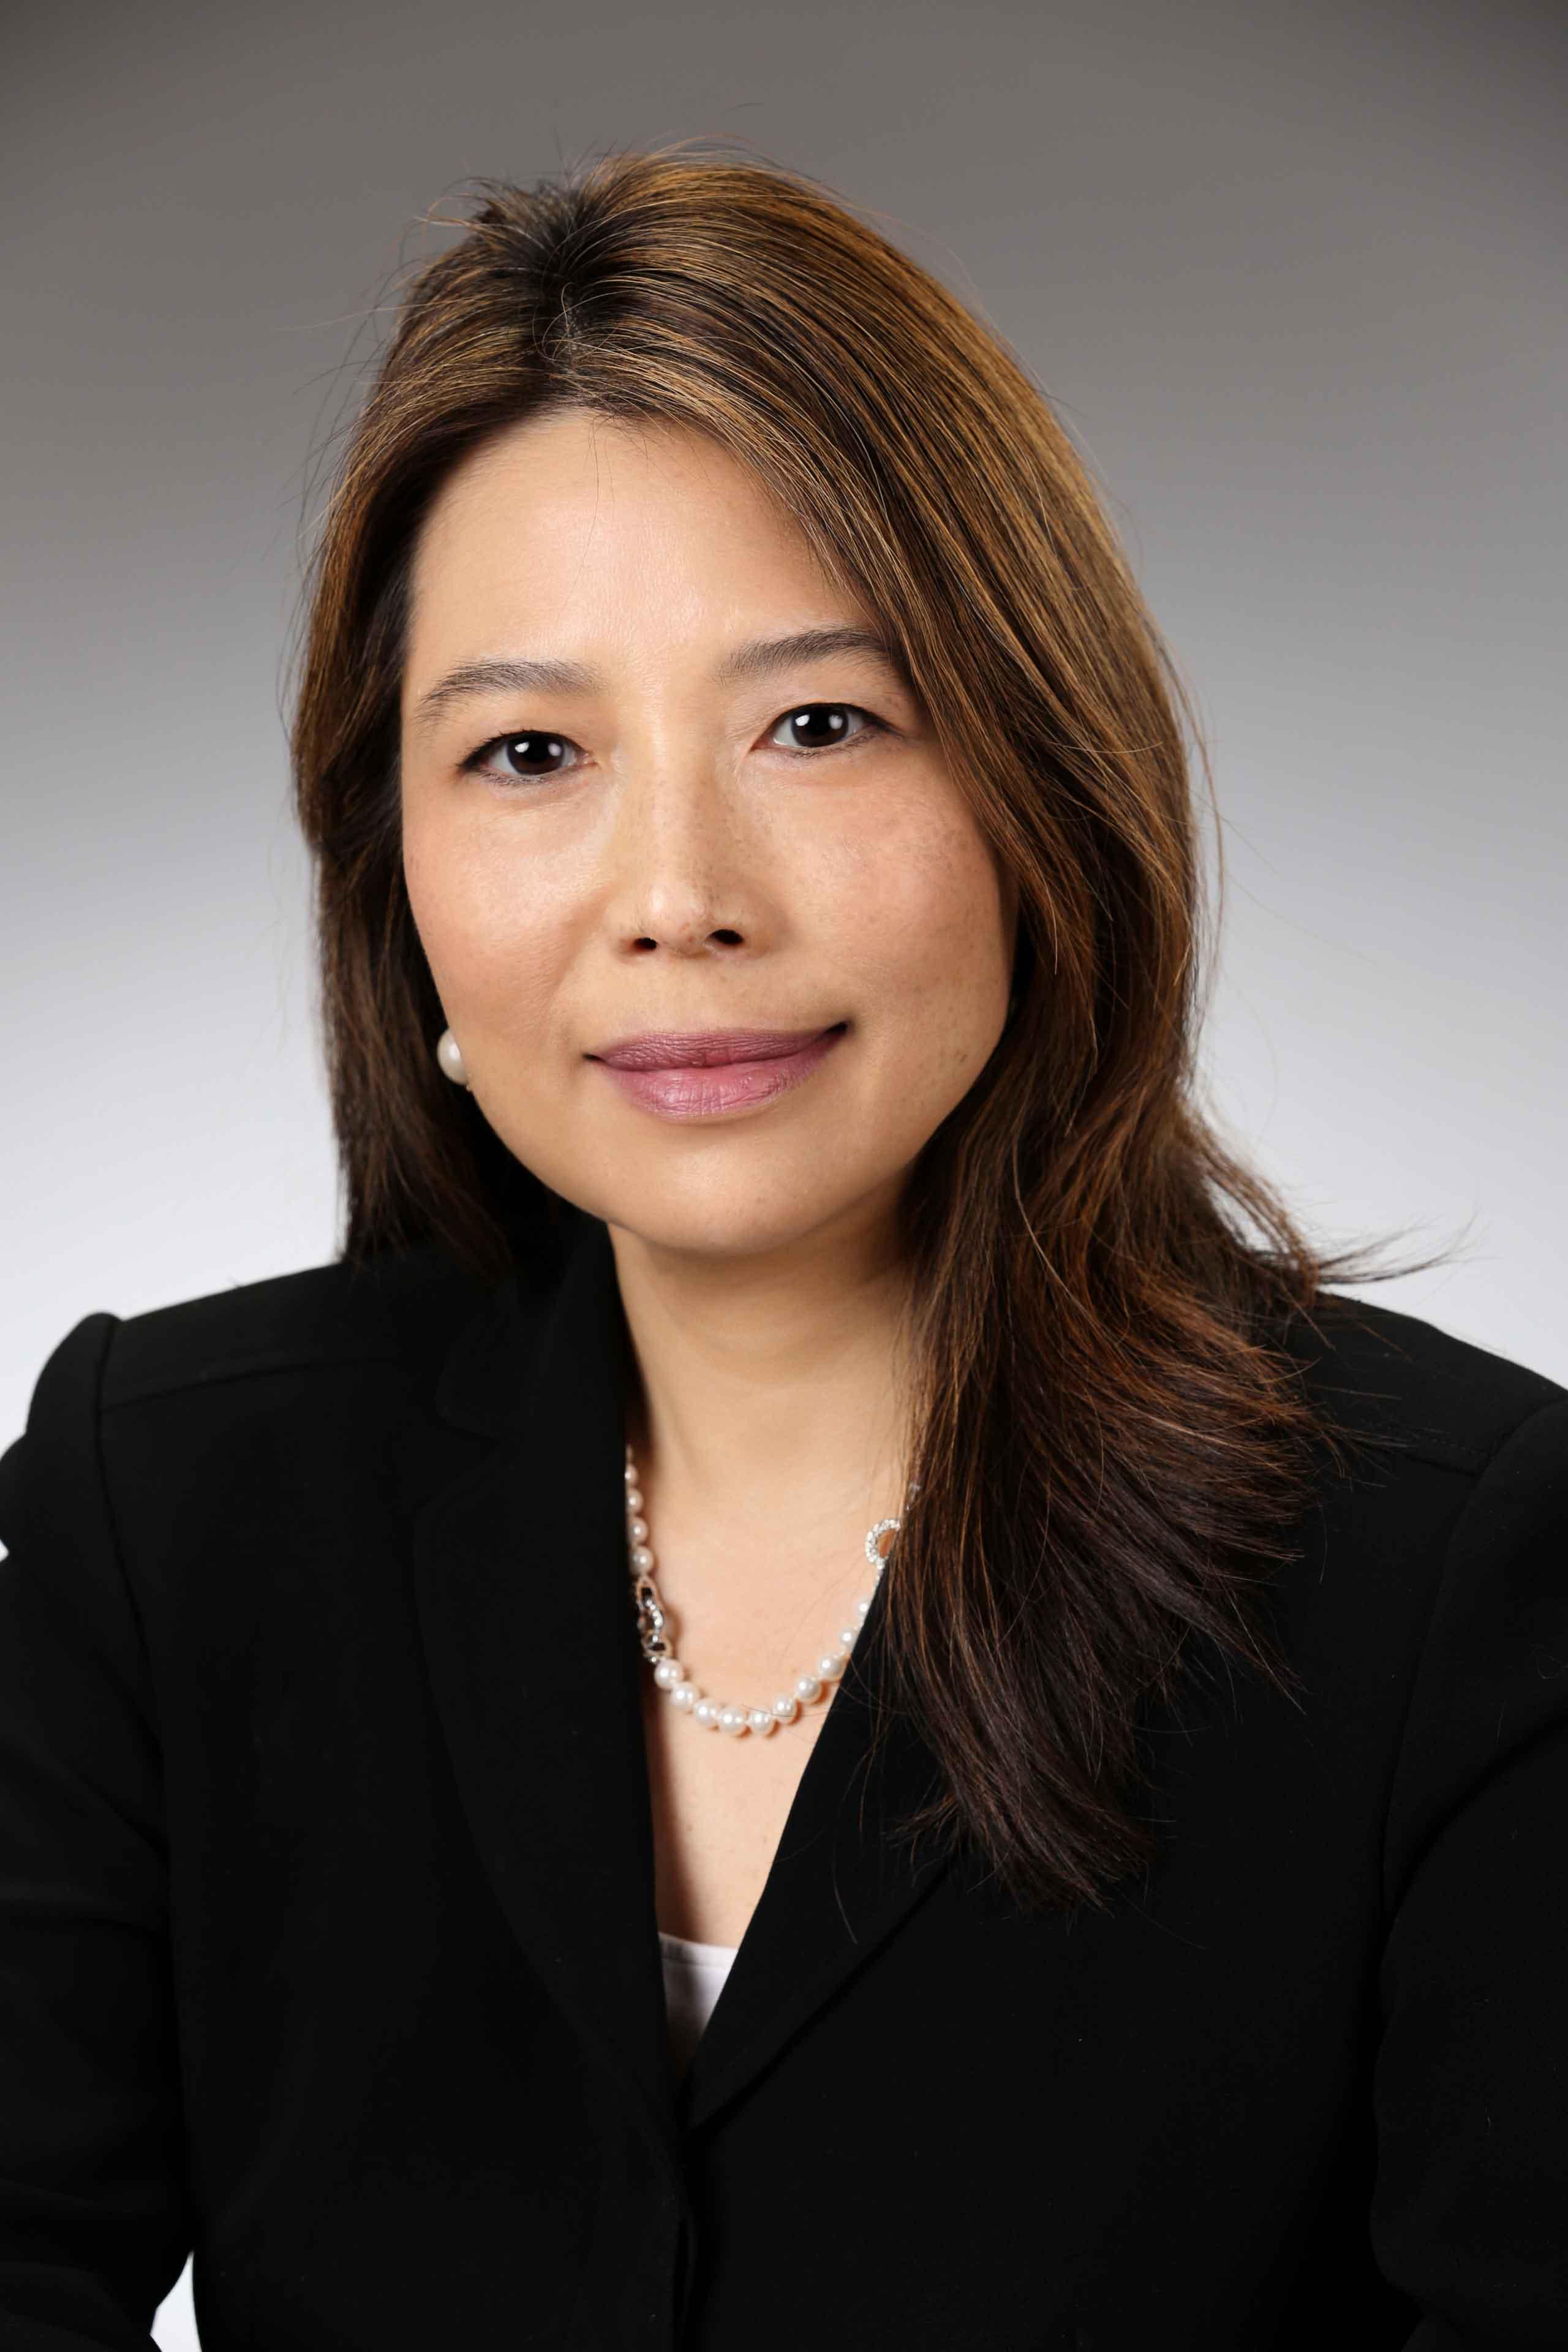 https://carey.jhu.edu/uploads/executive_education/__alt_tag/Elizabeth_Cho-Fertikh.jpg